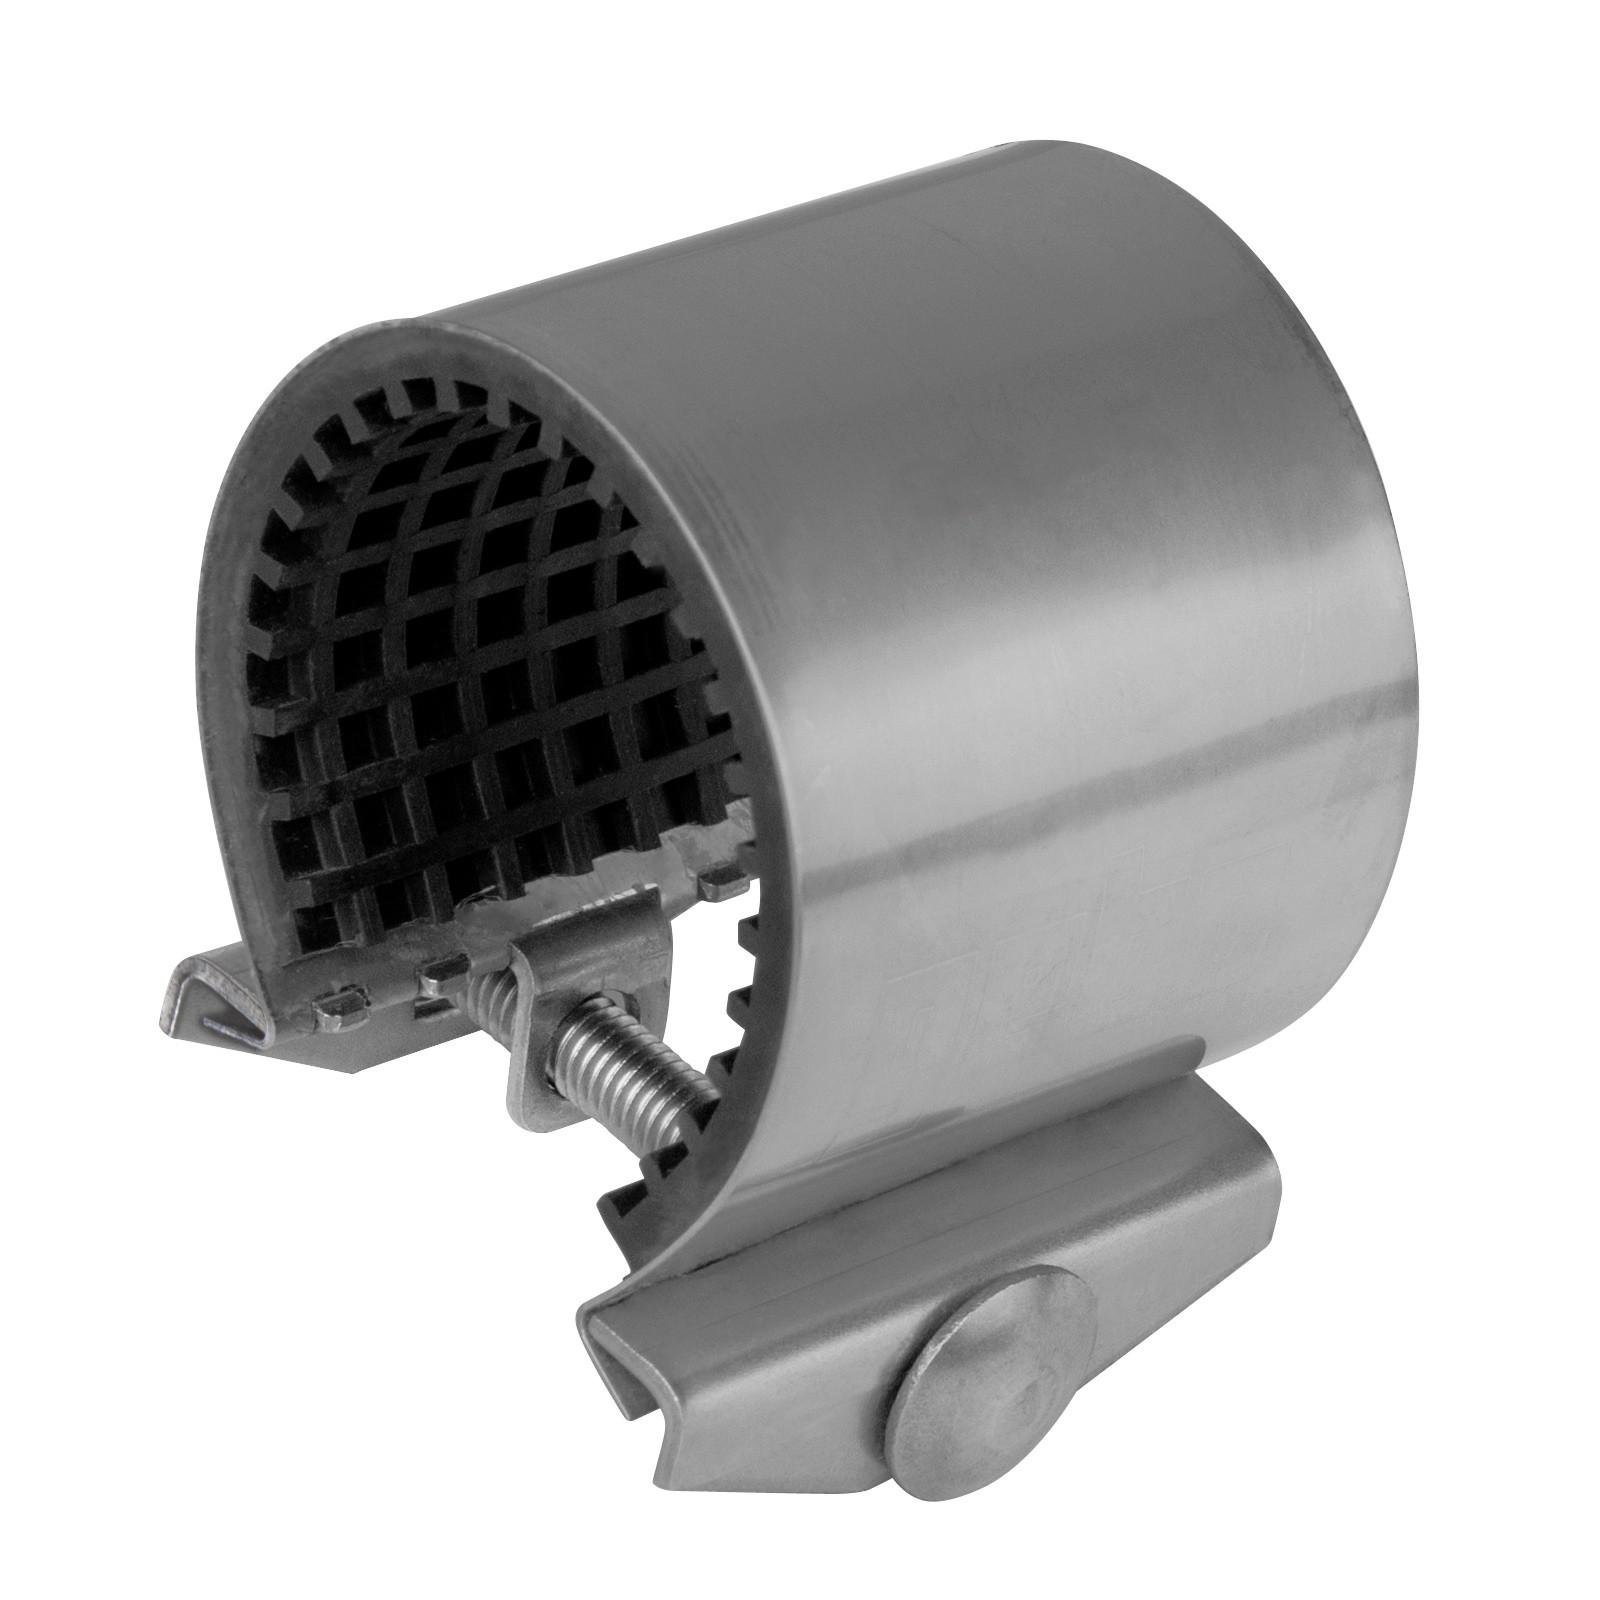 edelstahl rohr dichtband / dichtschelle 42-45 mm 1 1/4 zoll unifix